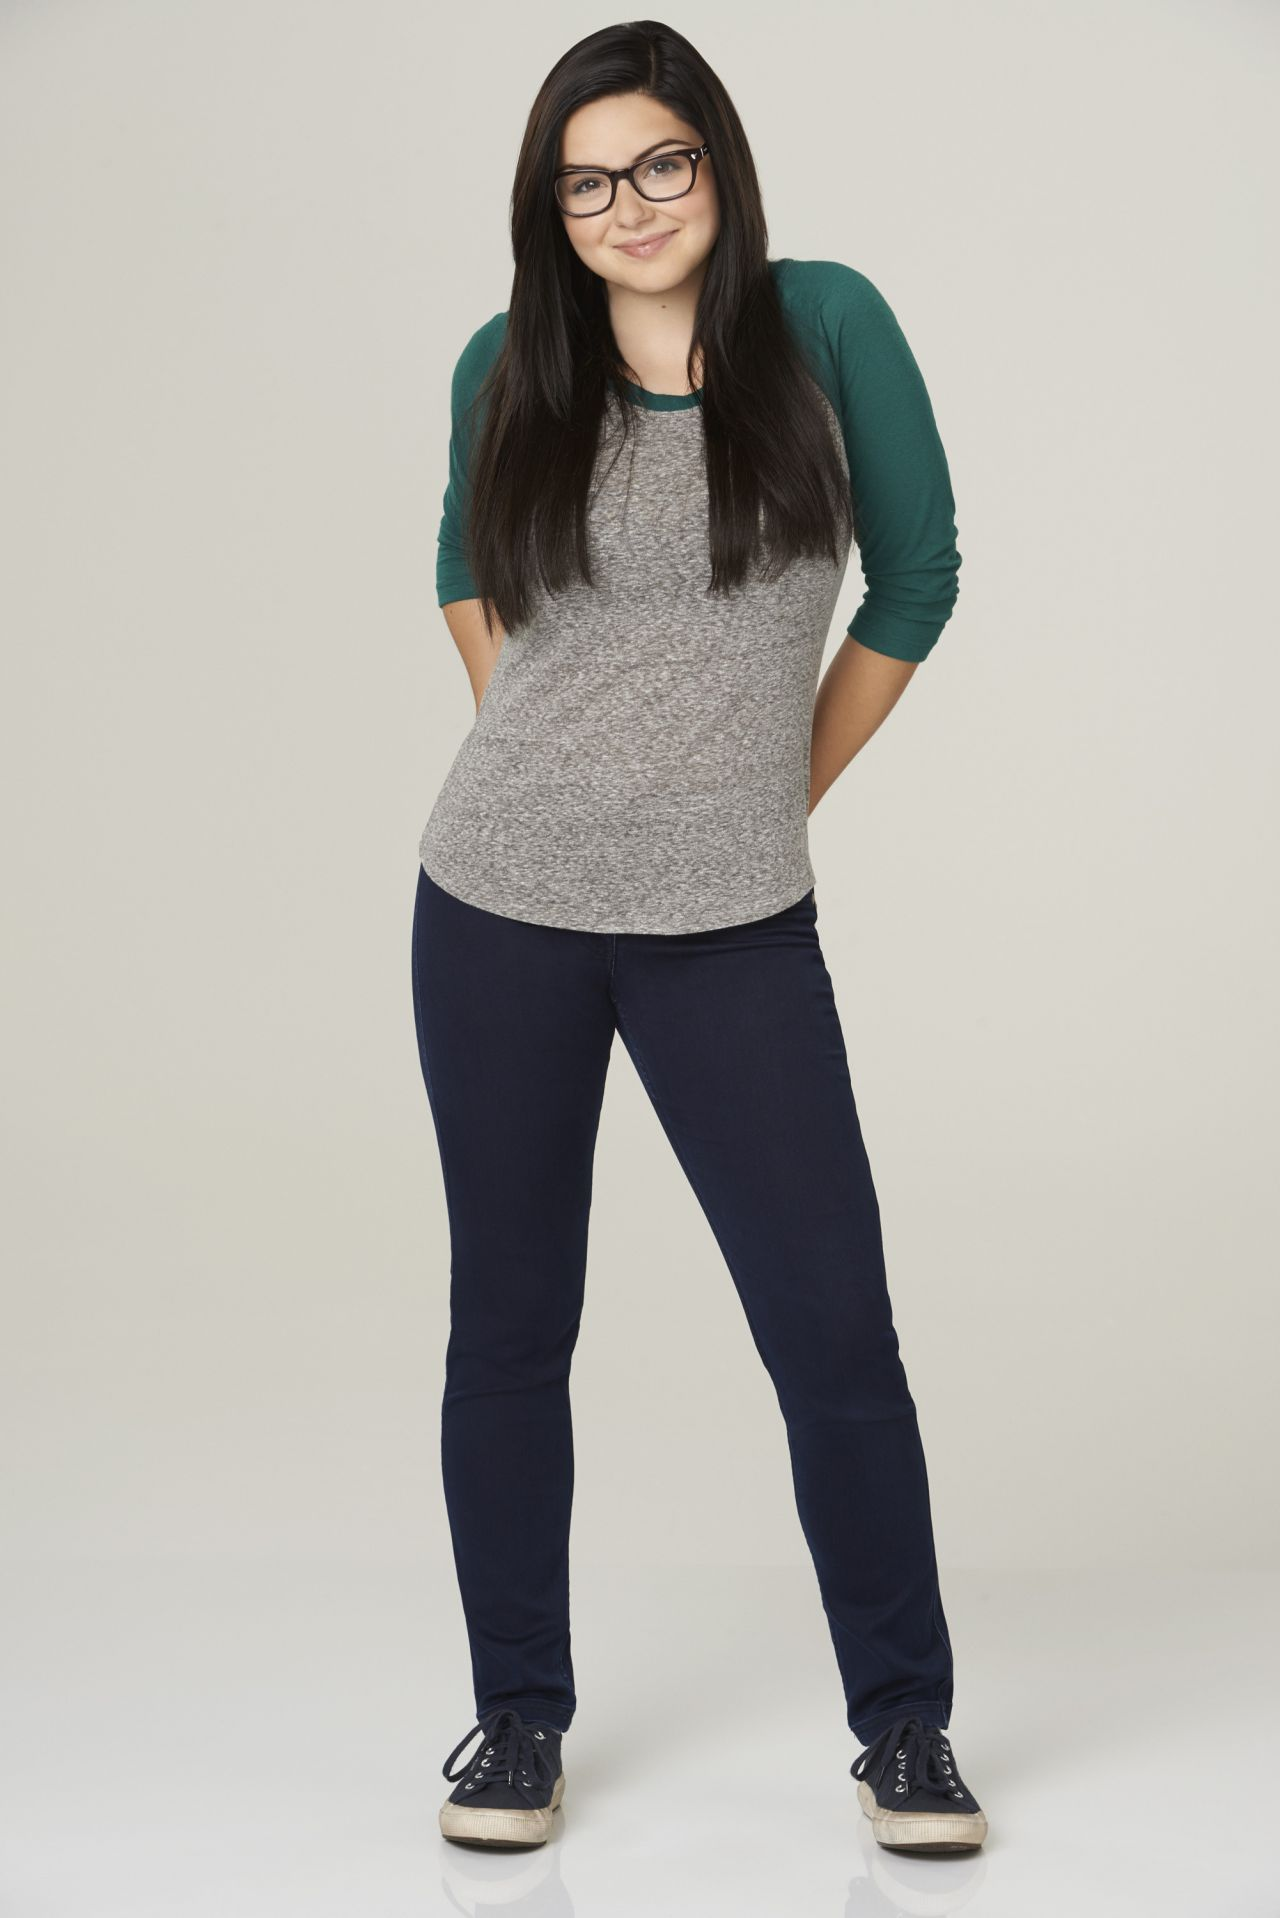 Ariel Winter - Modern Family Season 6 Promo Shots • CelebMafia